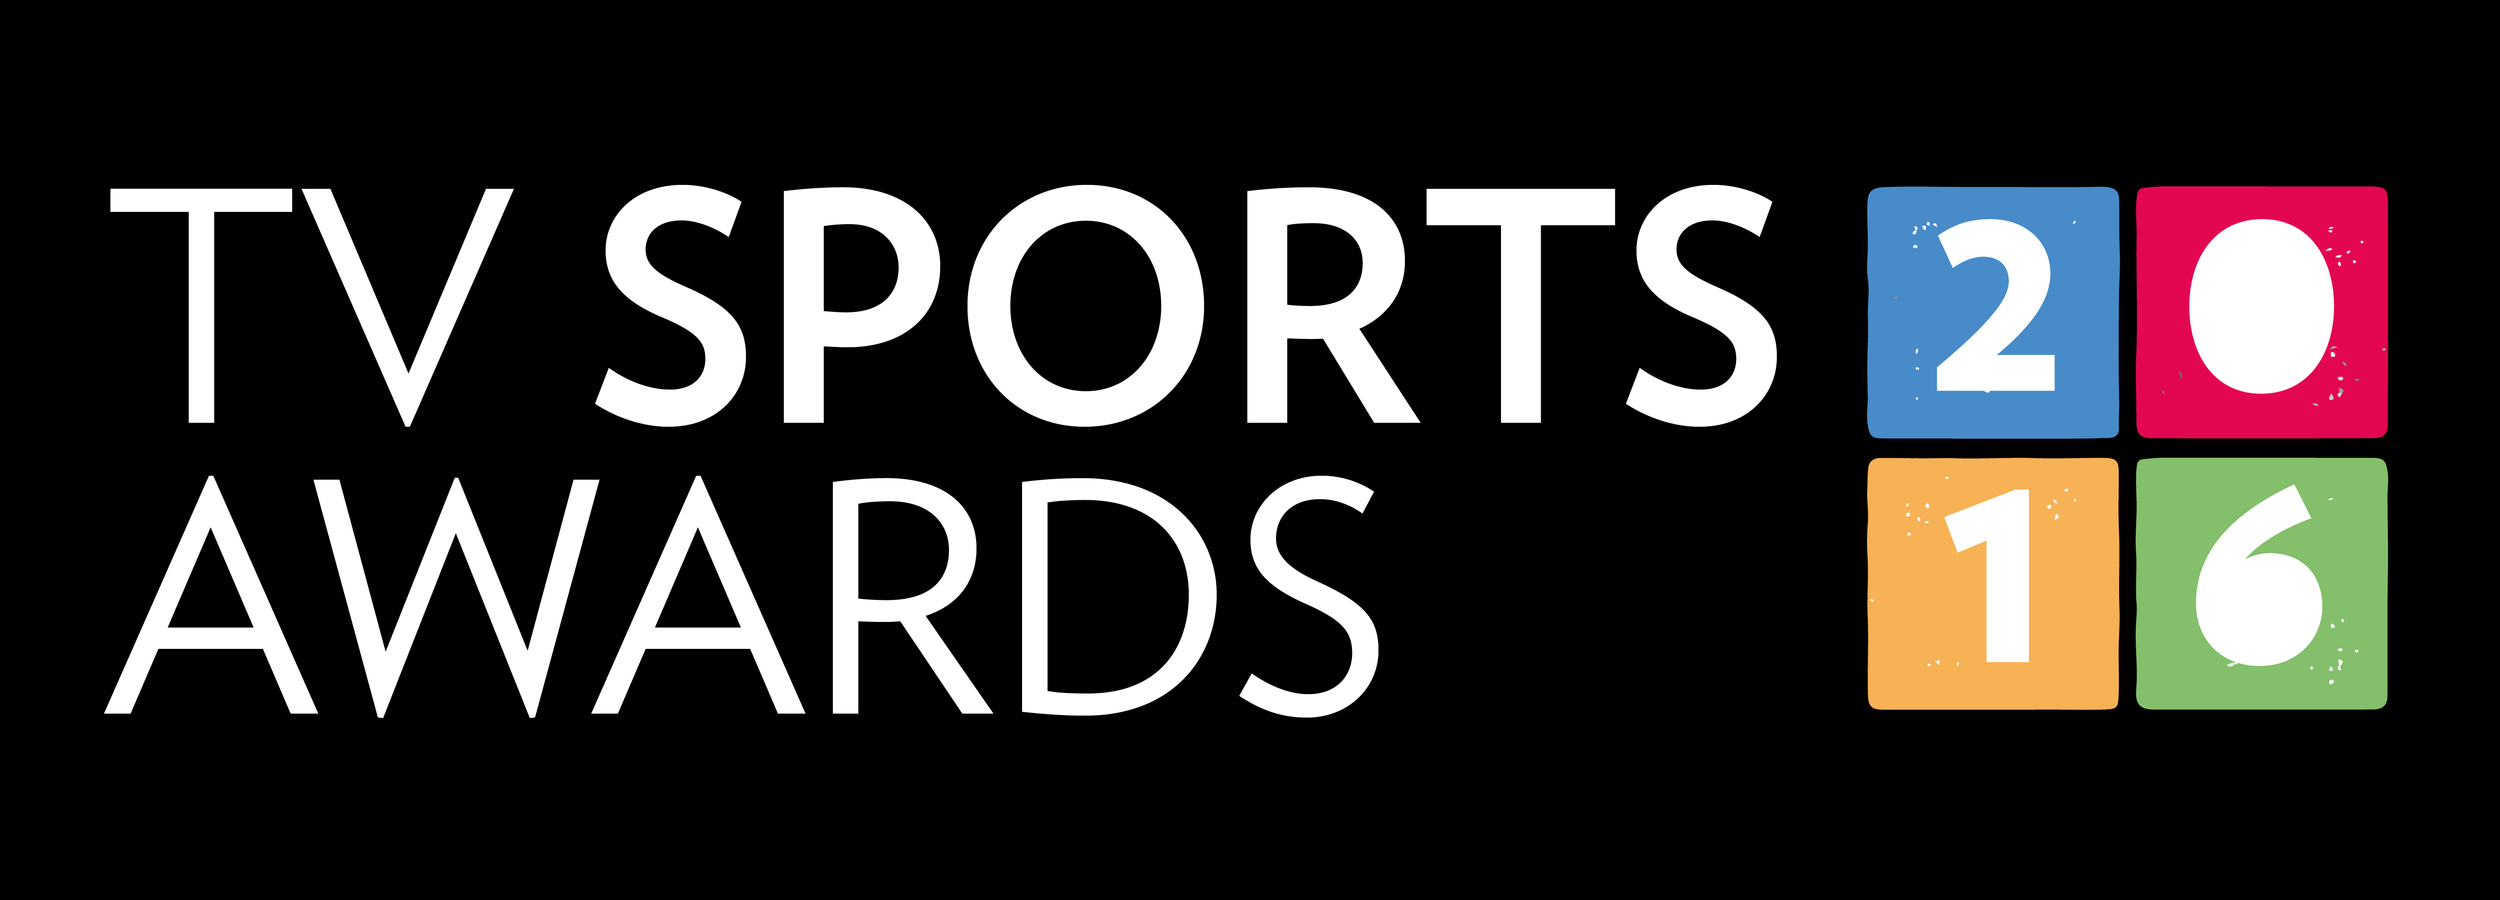 2016TVsportsawards_Artboard 3.jpg